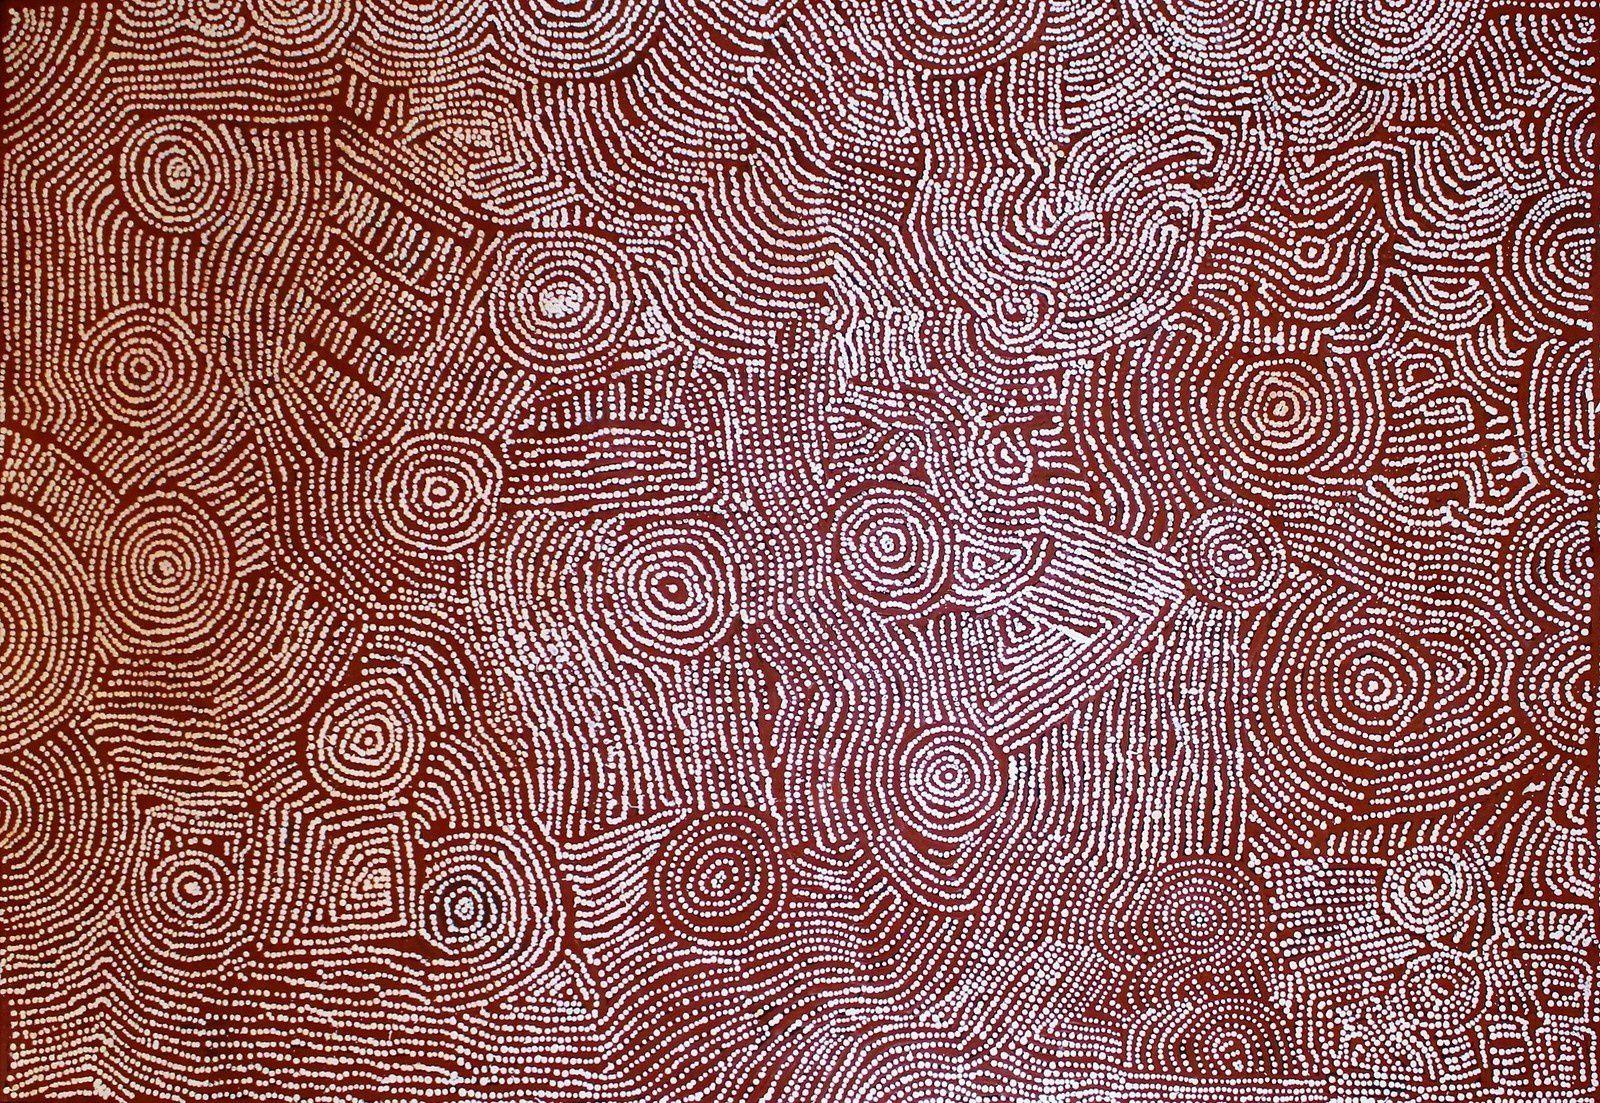 Maisie Campbell Napaljarri, Ngurra, my country. 125x180 cm, acrylique sur lin